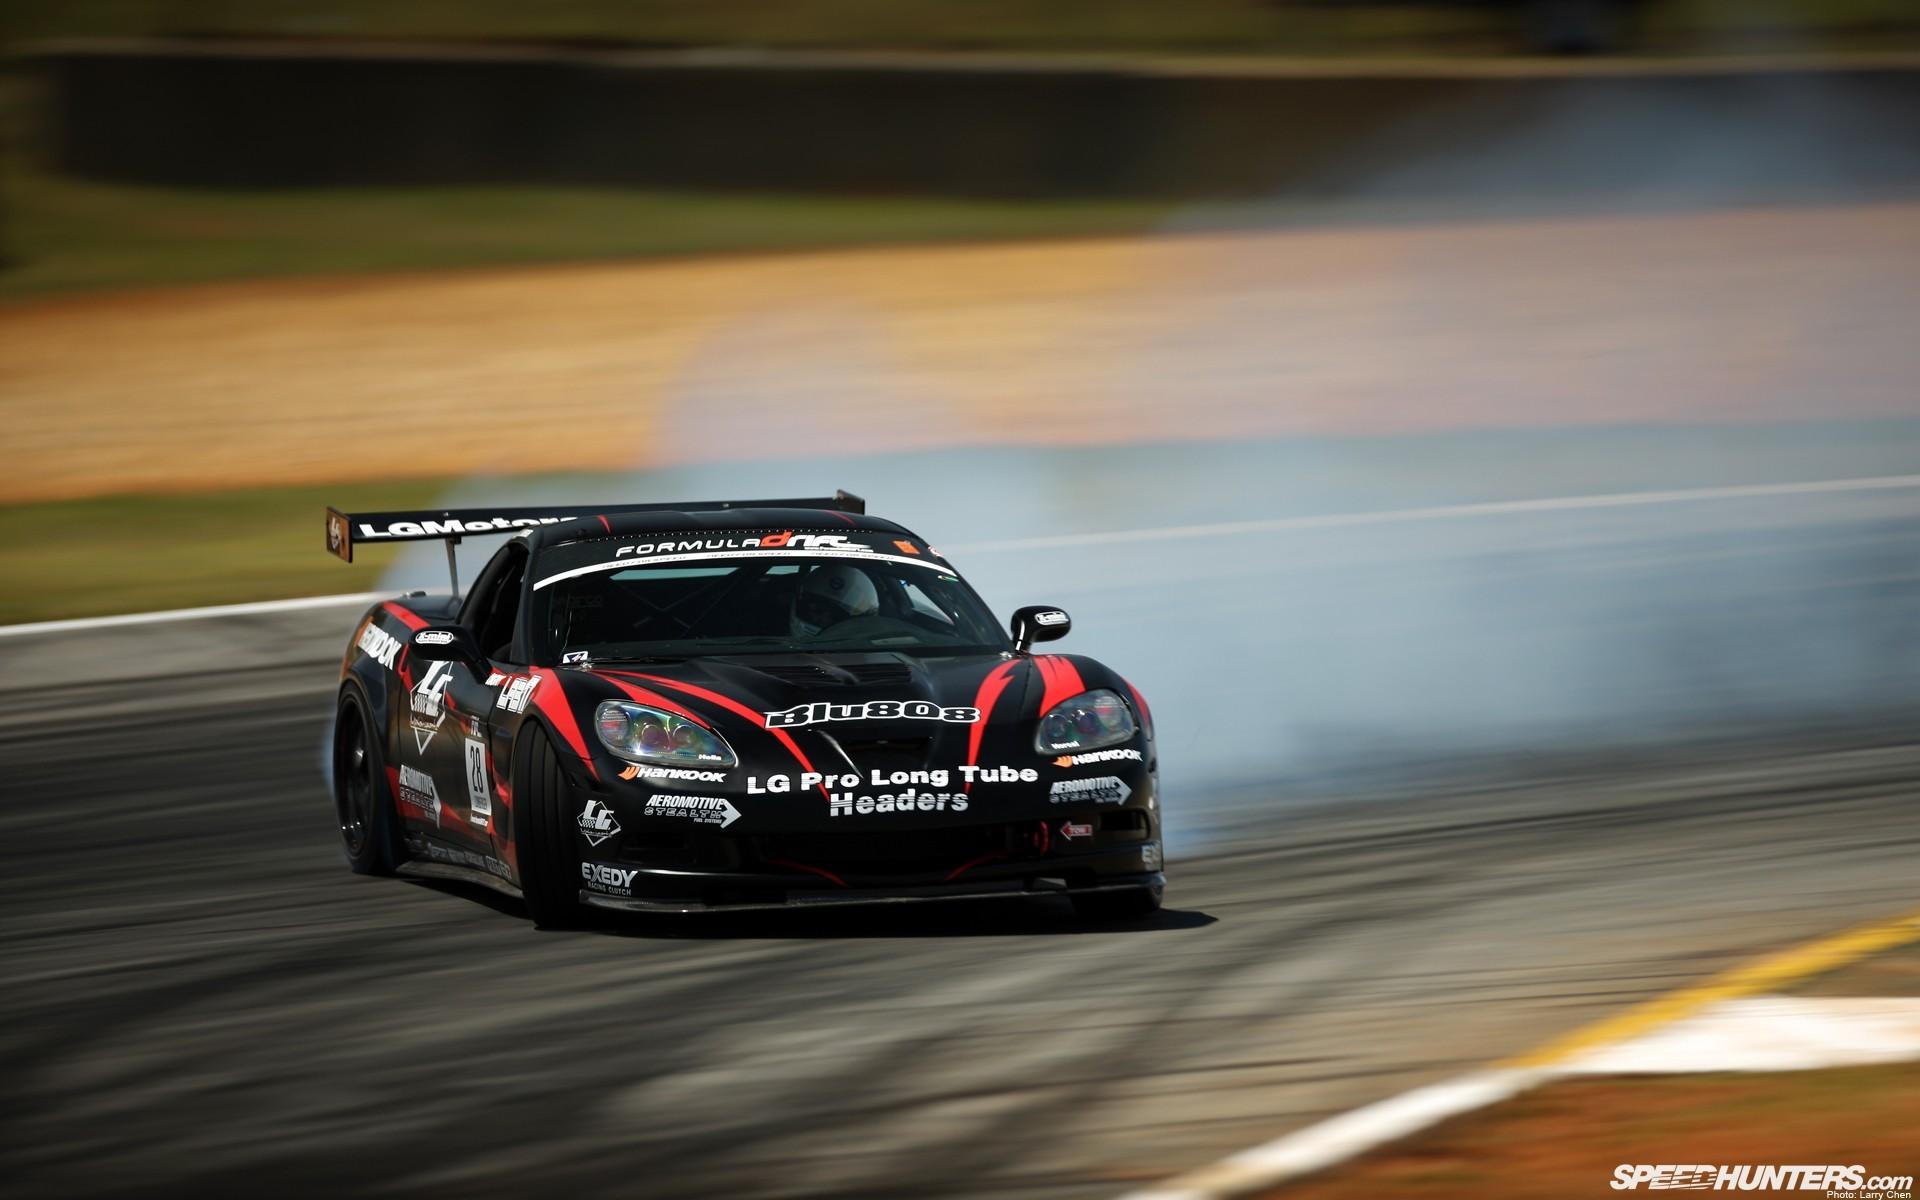 Cars chevrolet drifting cars racer vehicles drifting - Drift car wallpaper ...